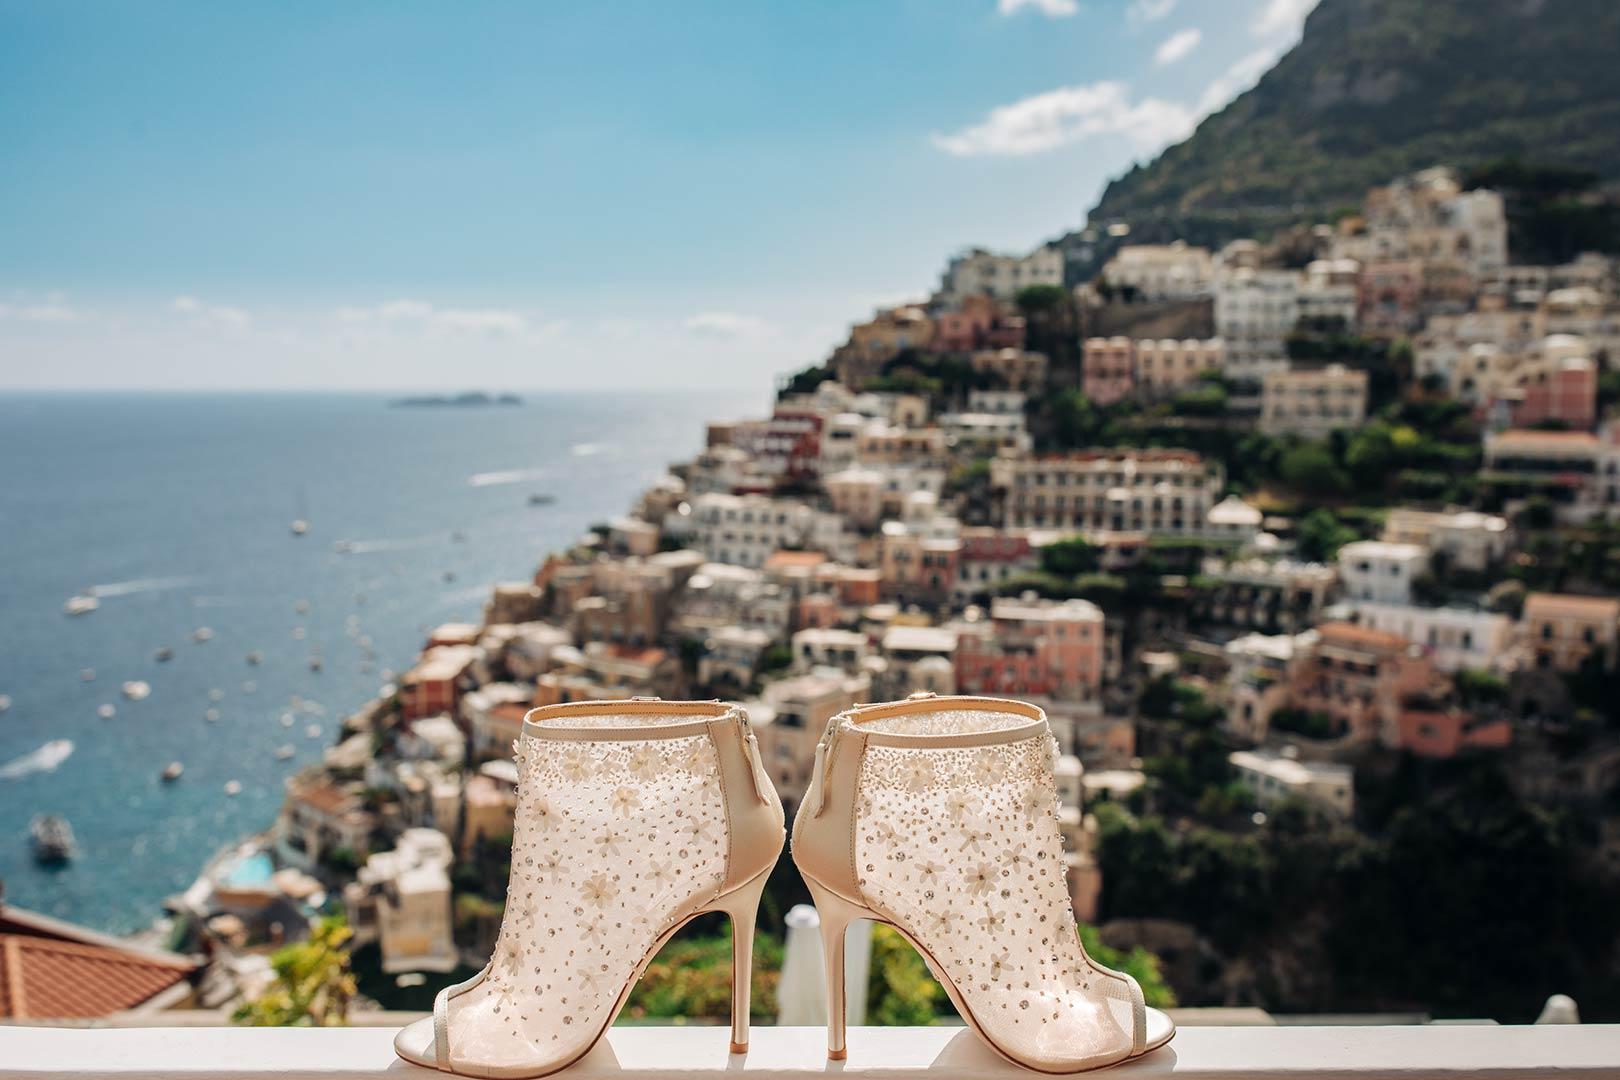 Elopement-in-Positano-Amalfi-Coast-Wendy-Tony-featured